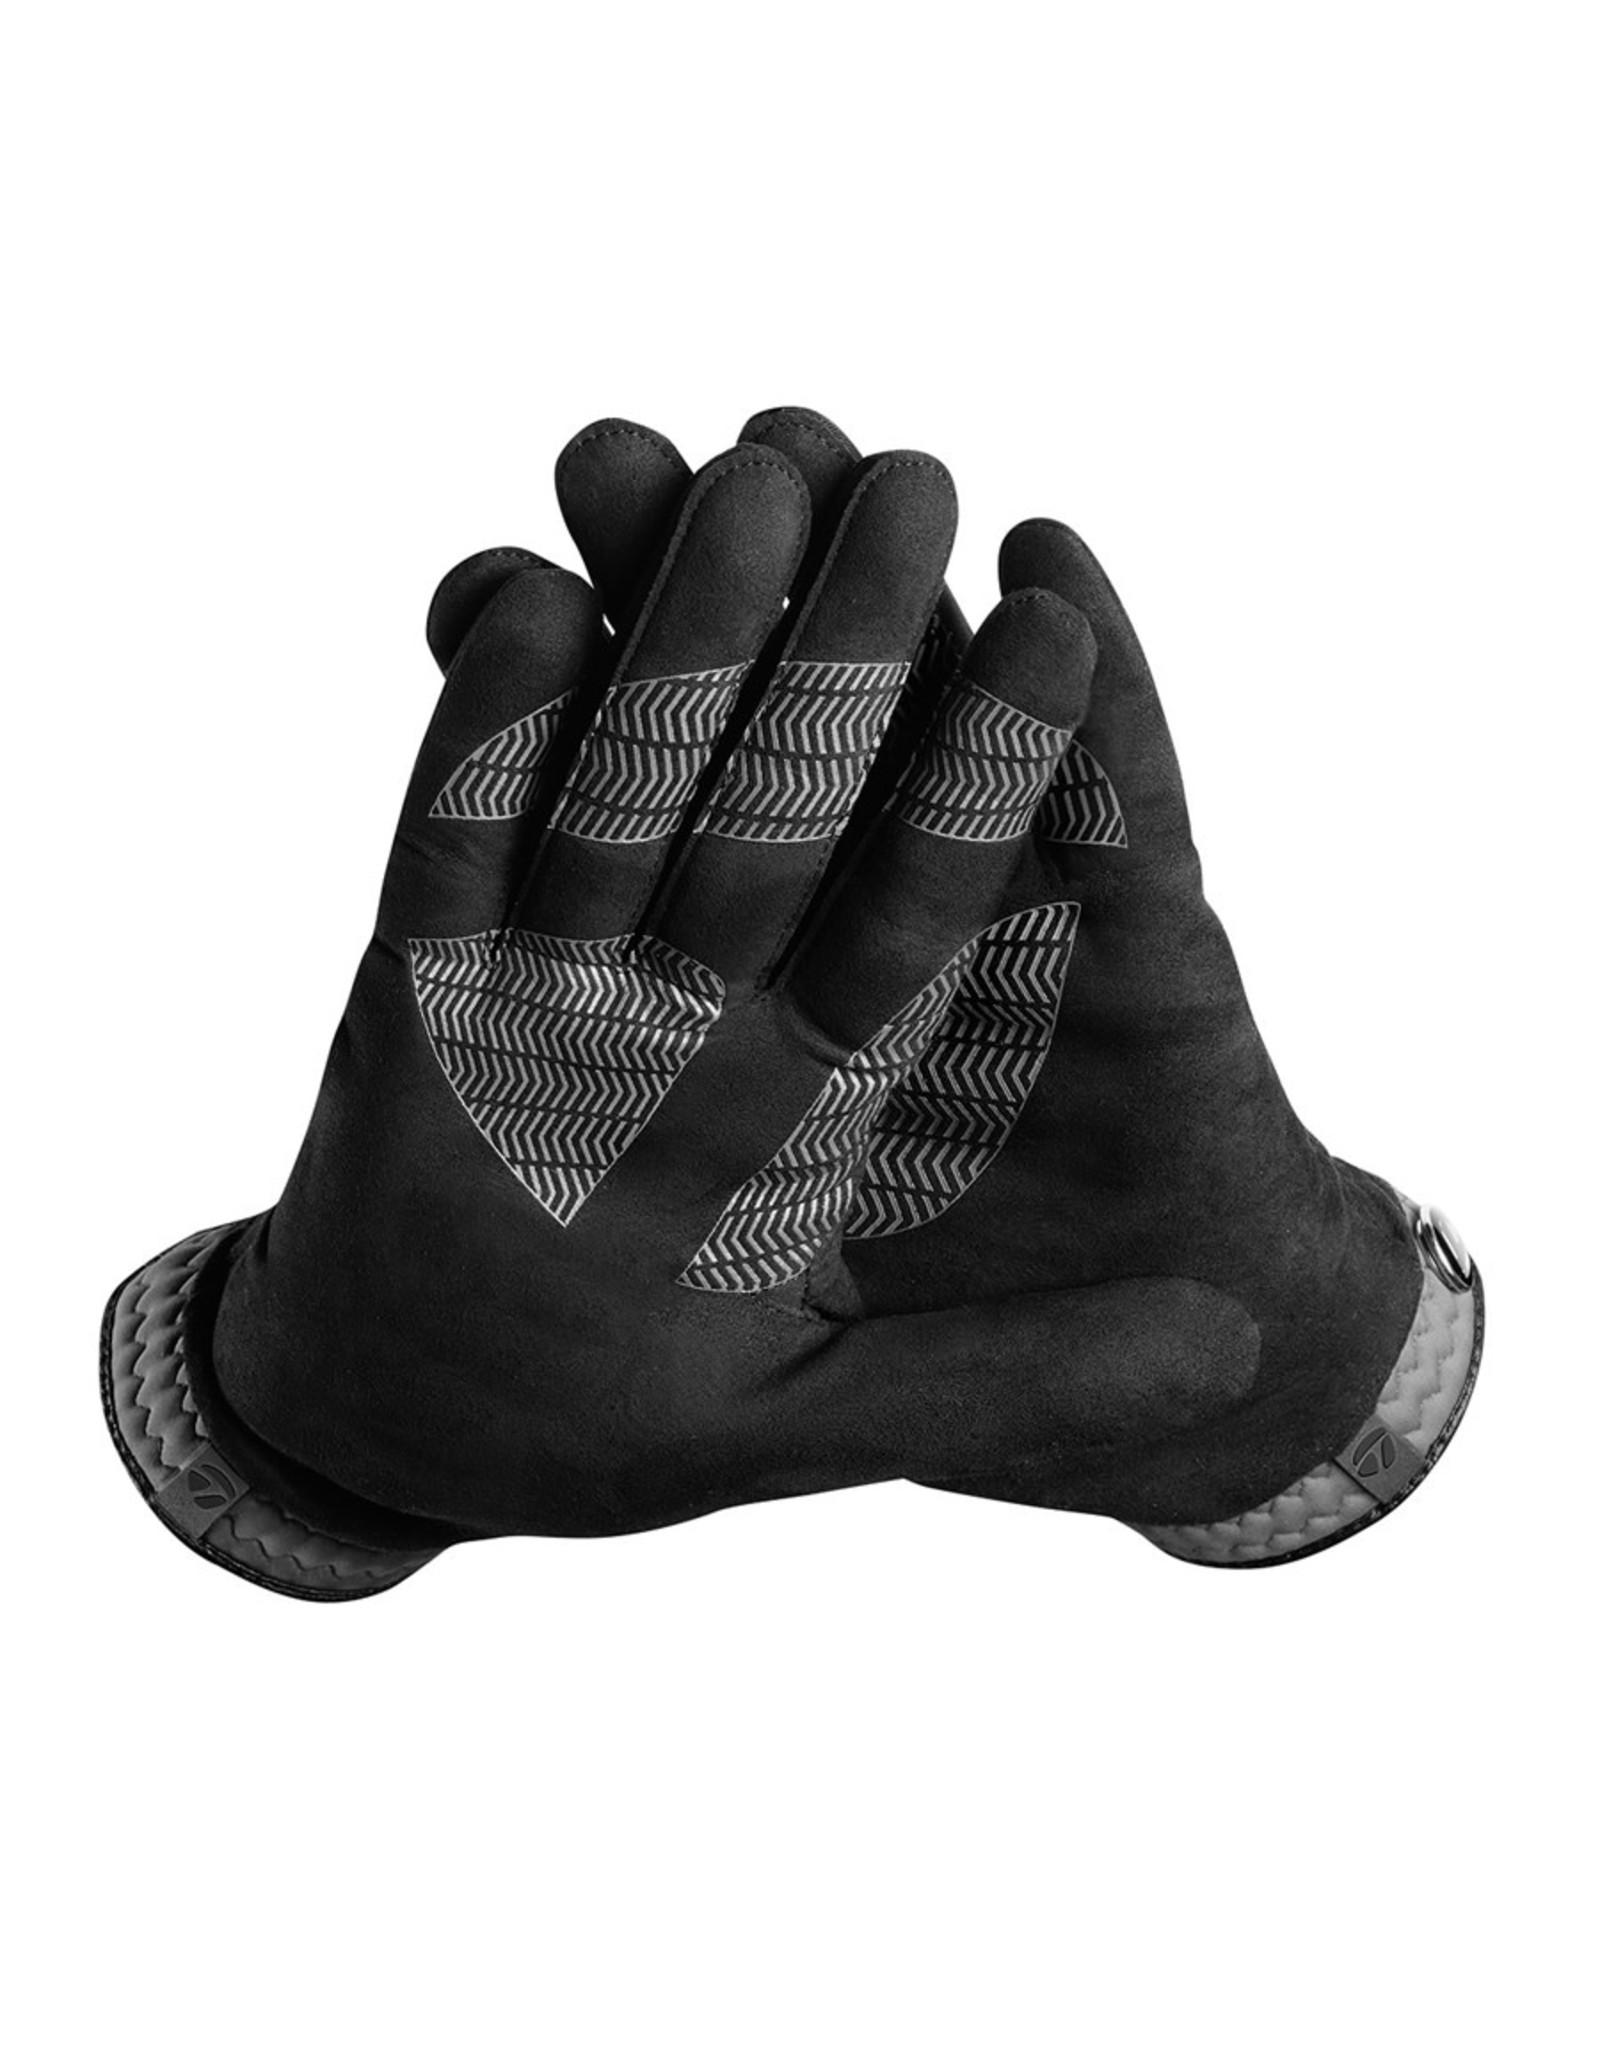 TaylorMade TaylorMade Rain Gloves